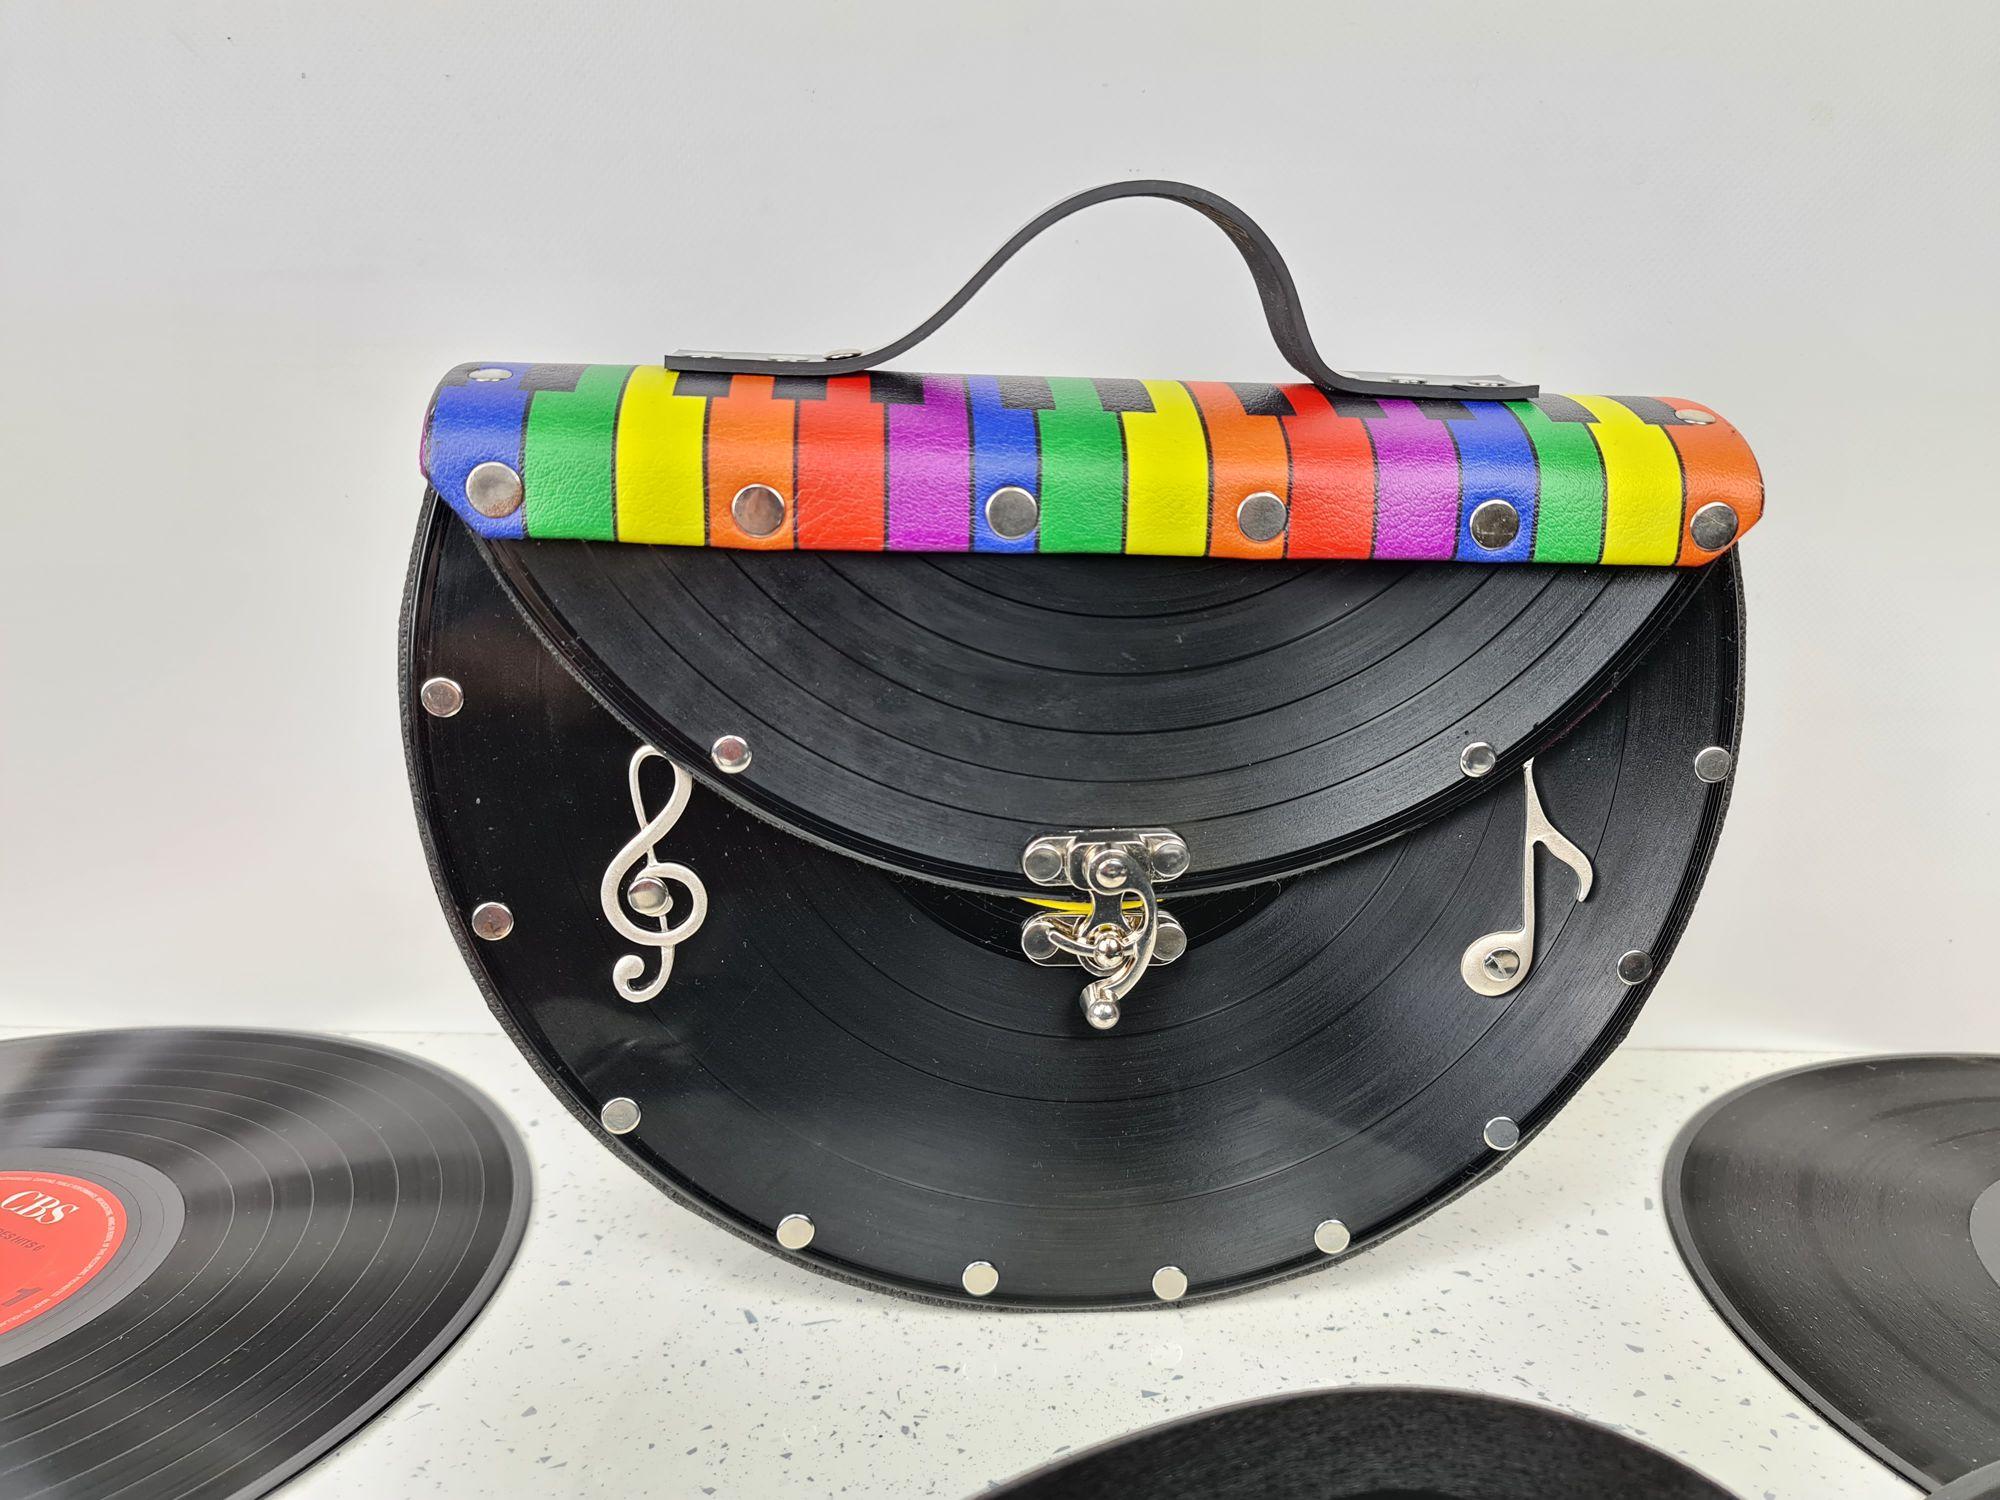 BA006b_sac-a-main-pin-up-rockabilly-retro-vinyl-33t